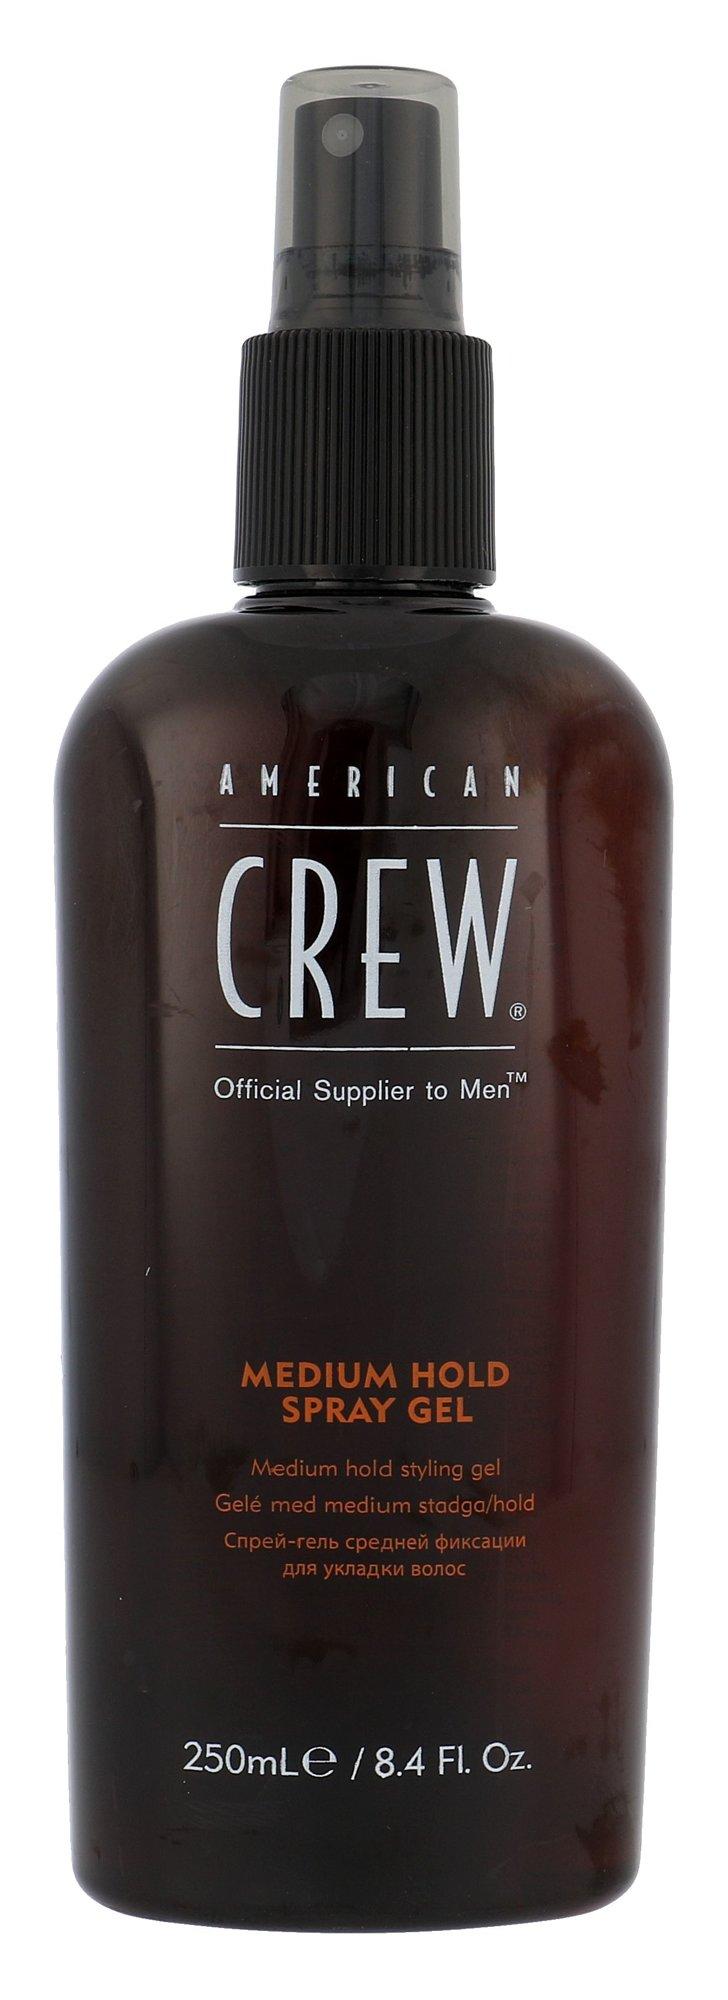 American Crew Classic Cosmetic 250ml  Medium Hold Spray Gel